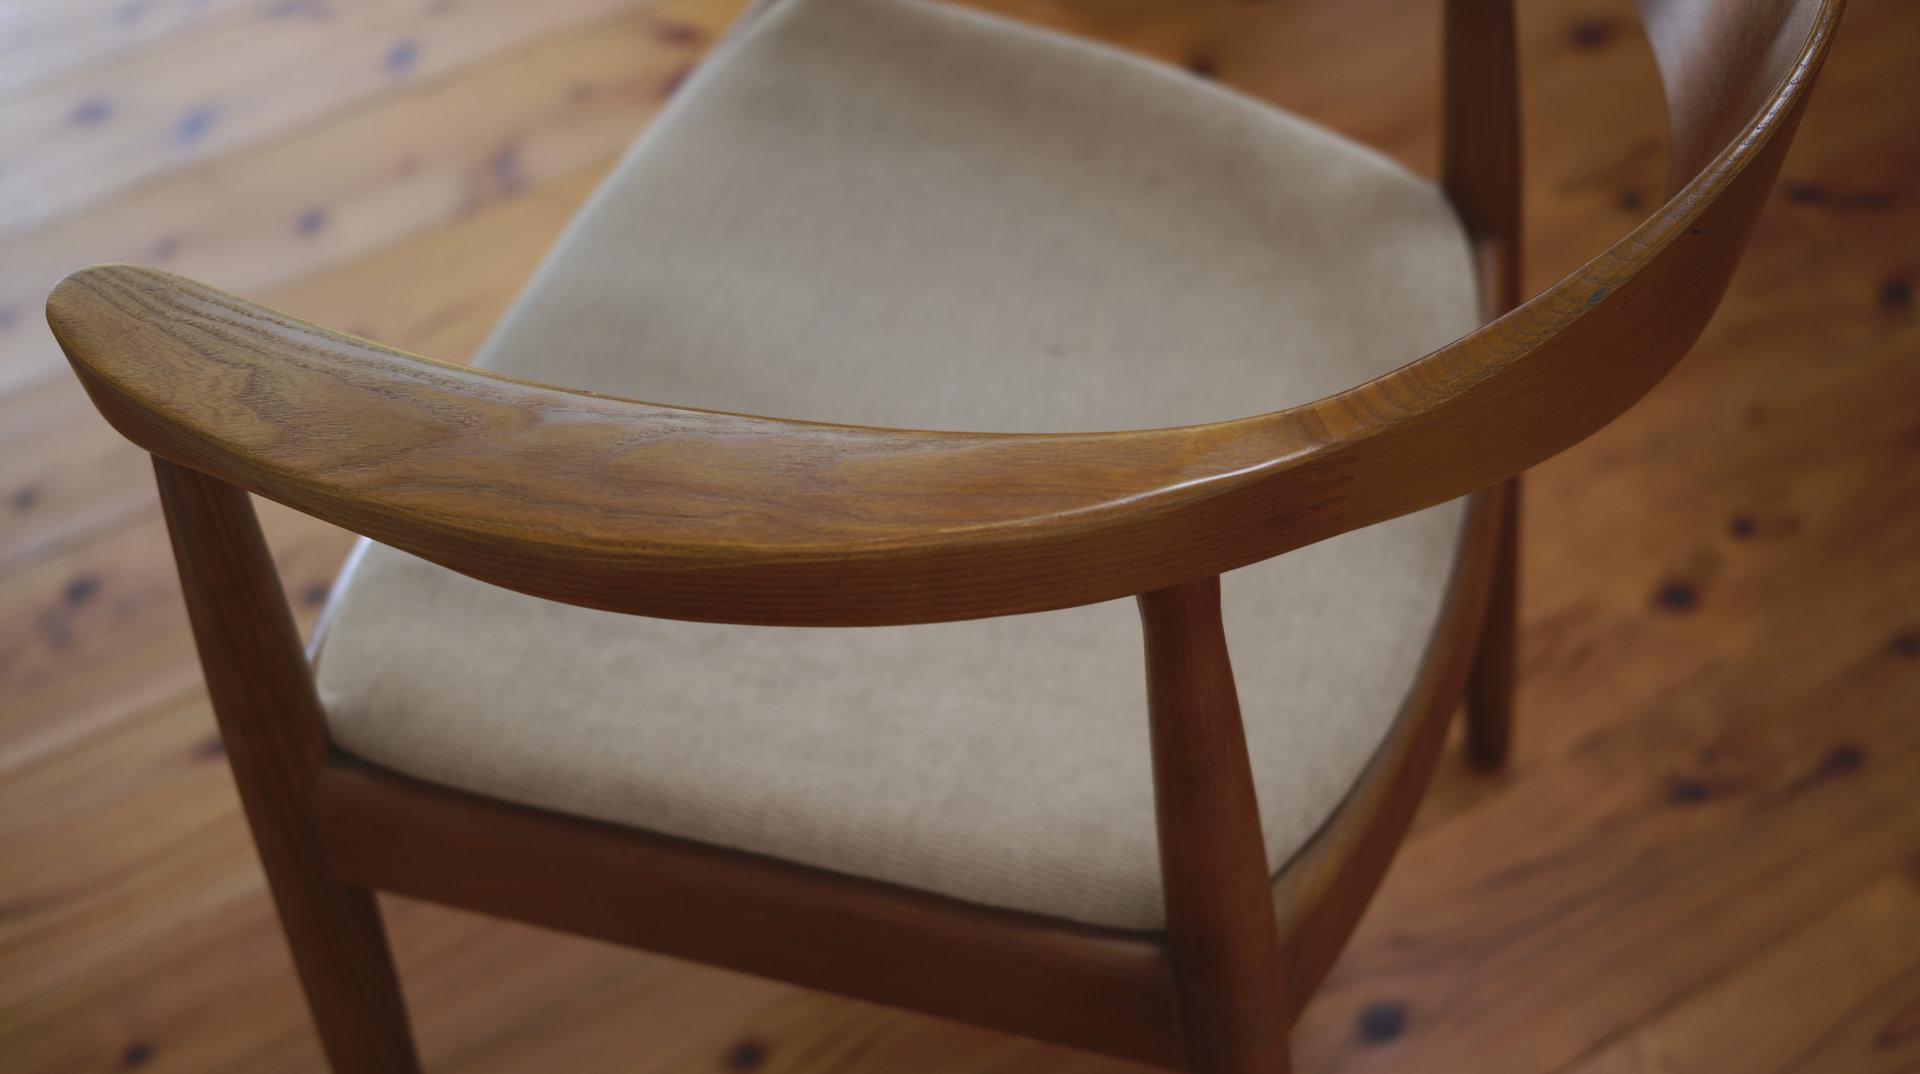 DETAIL 肘部の無垢材木目 北欧デザイナーズ木製チェア「PP503 The Chair / ハンス・J・ウェグナー」